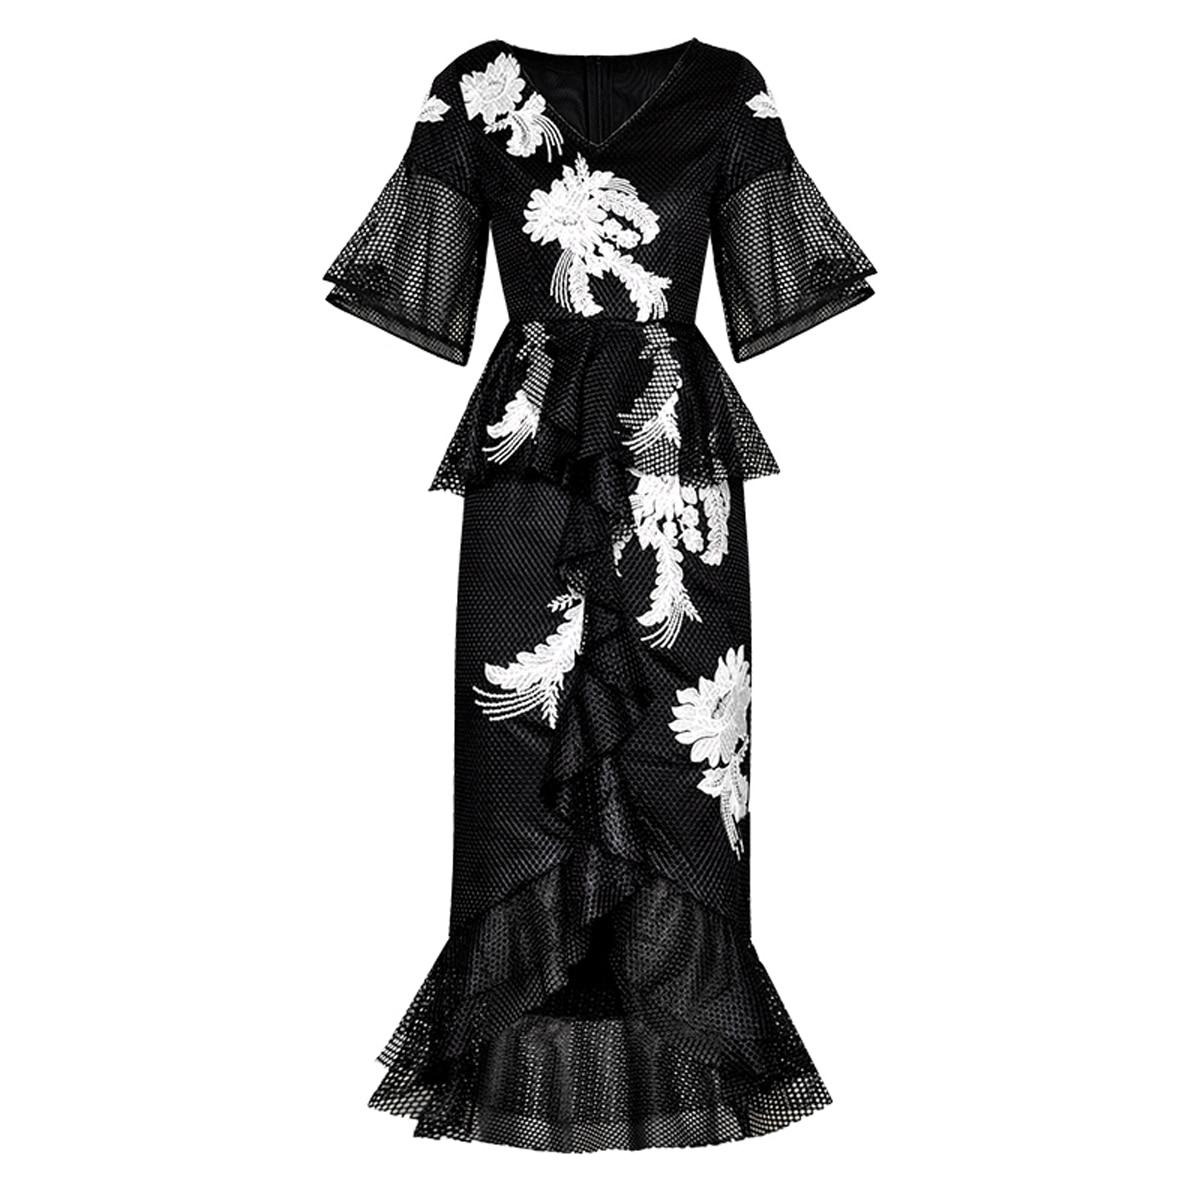 Red RoosaRosee Fashion Runway Designer Dress Summer Women Floral Embroidery Black Mermaid Dresses Sexy Party Vestidos